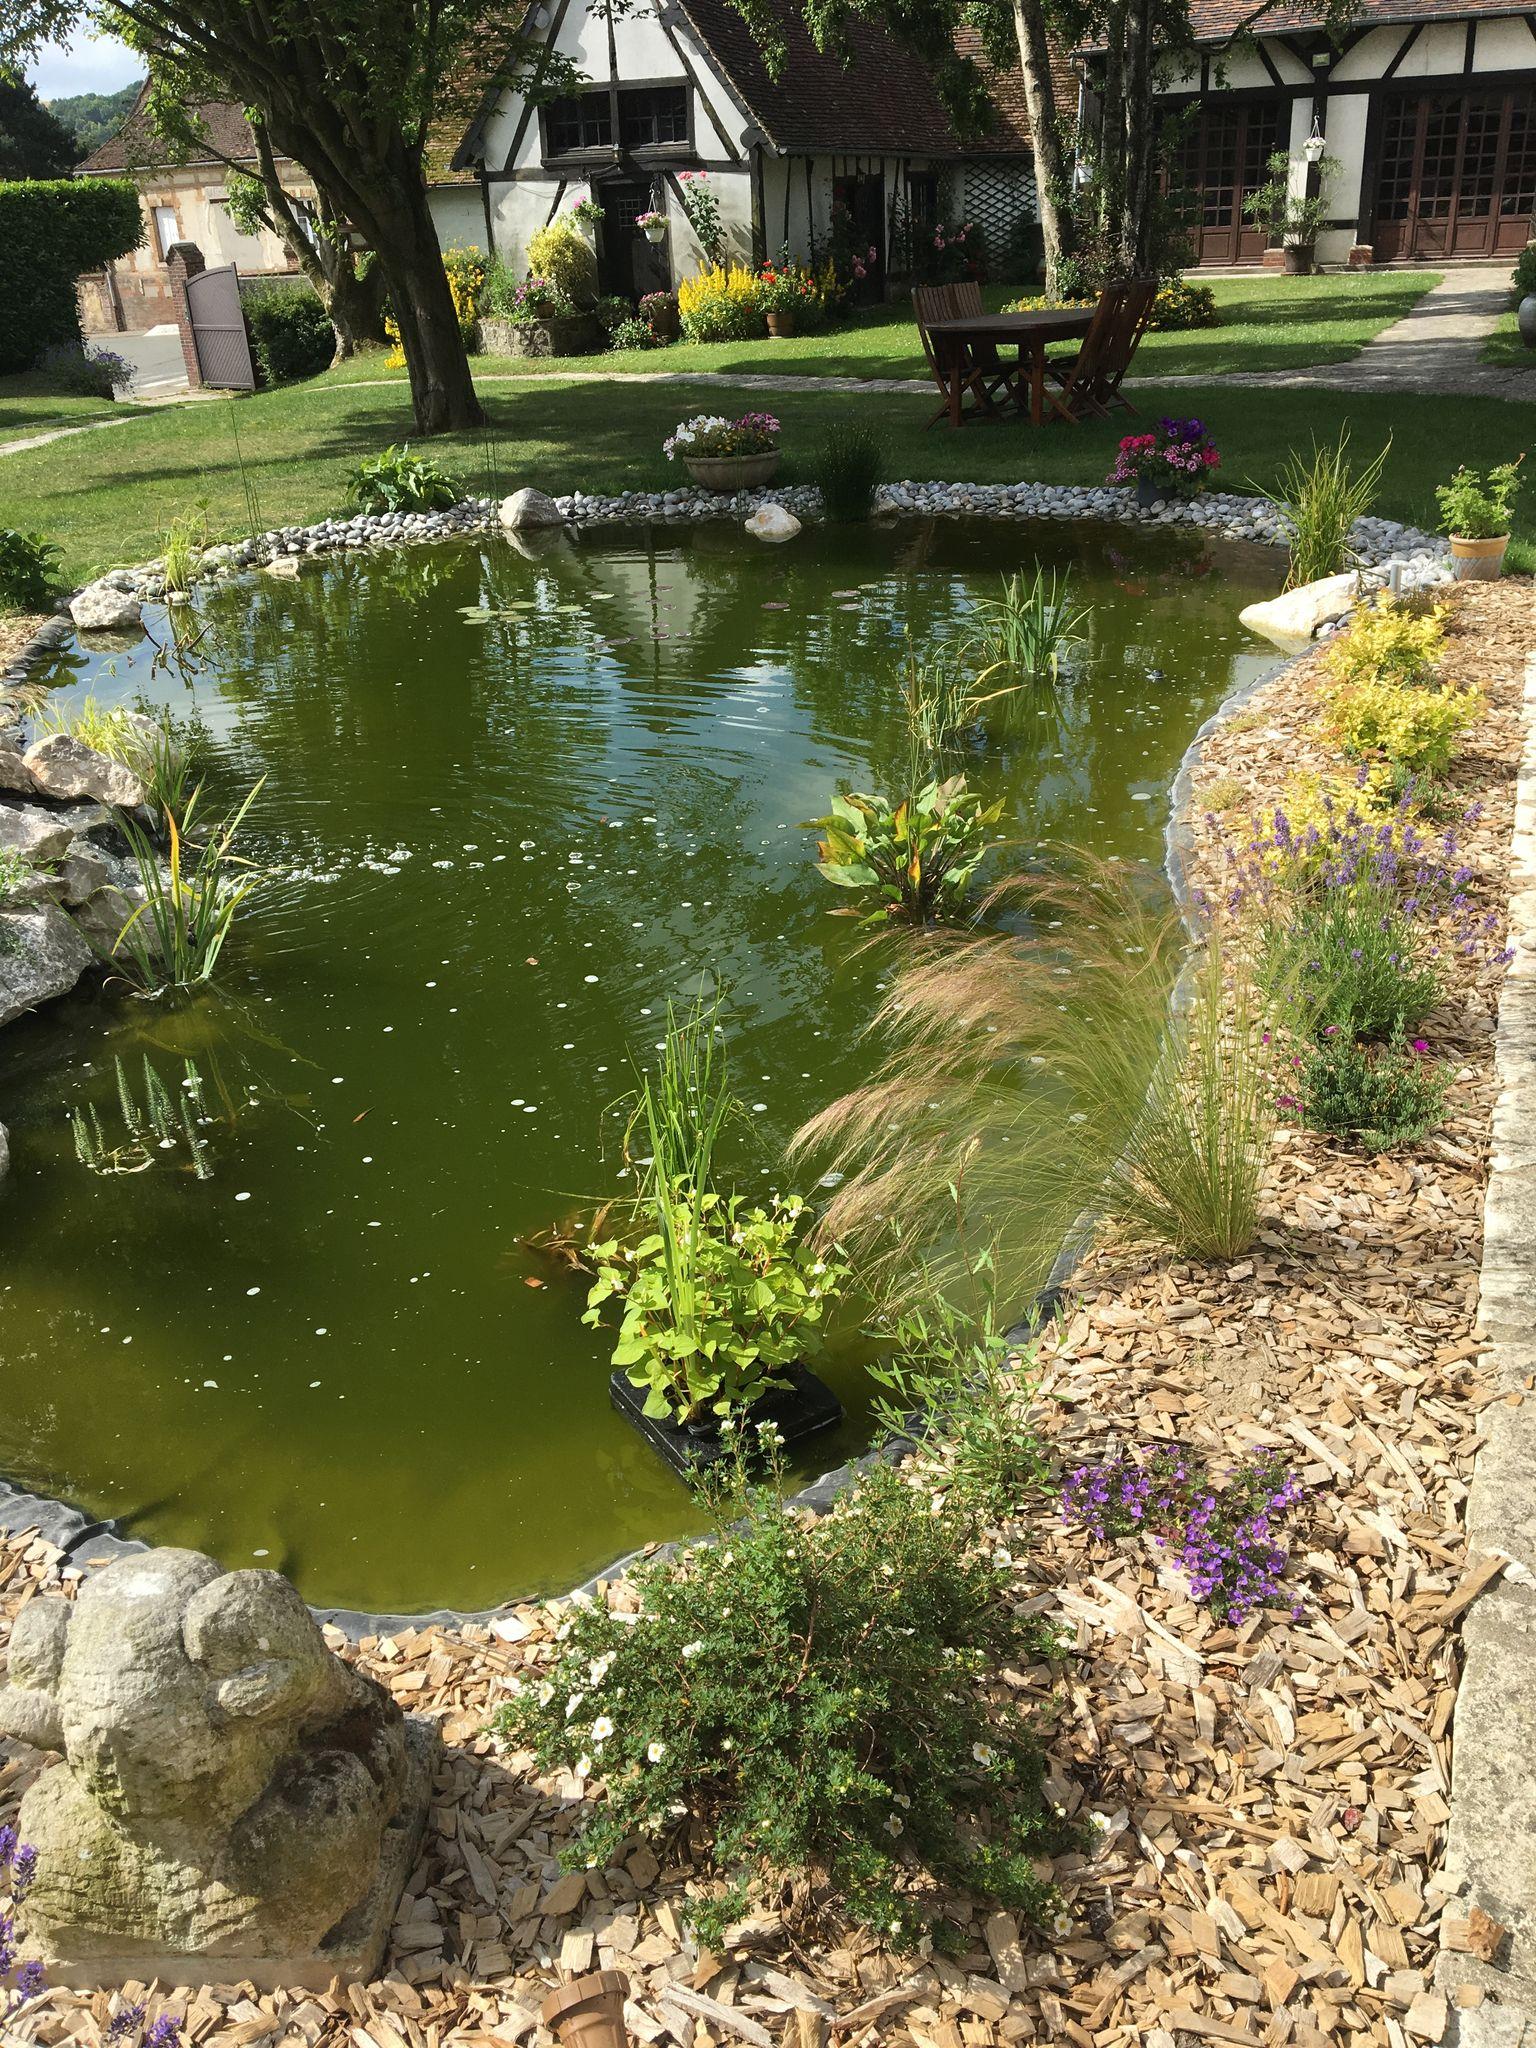 maillard paysage création jardin bassin piscine naturelle oise goincourt